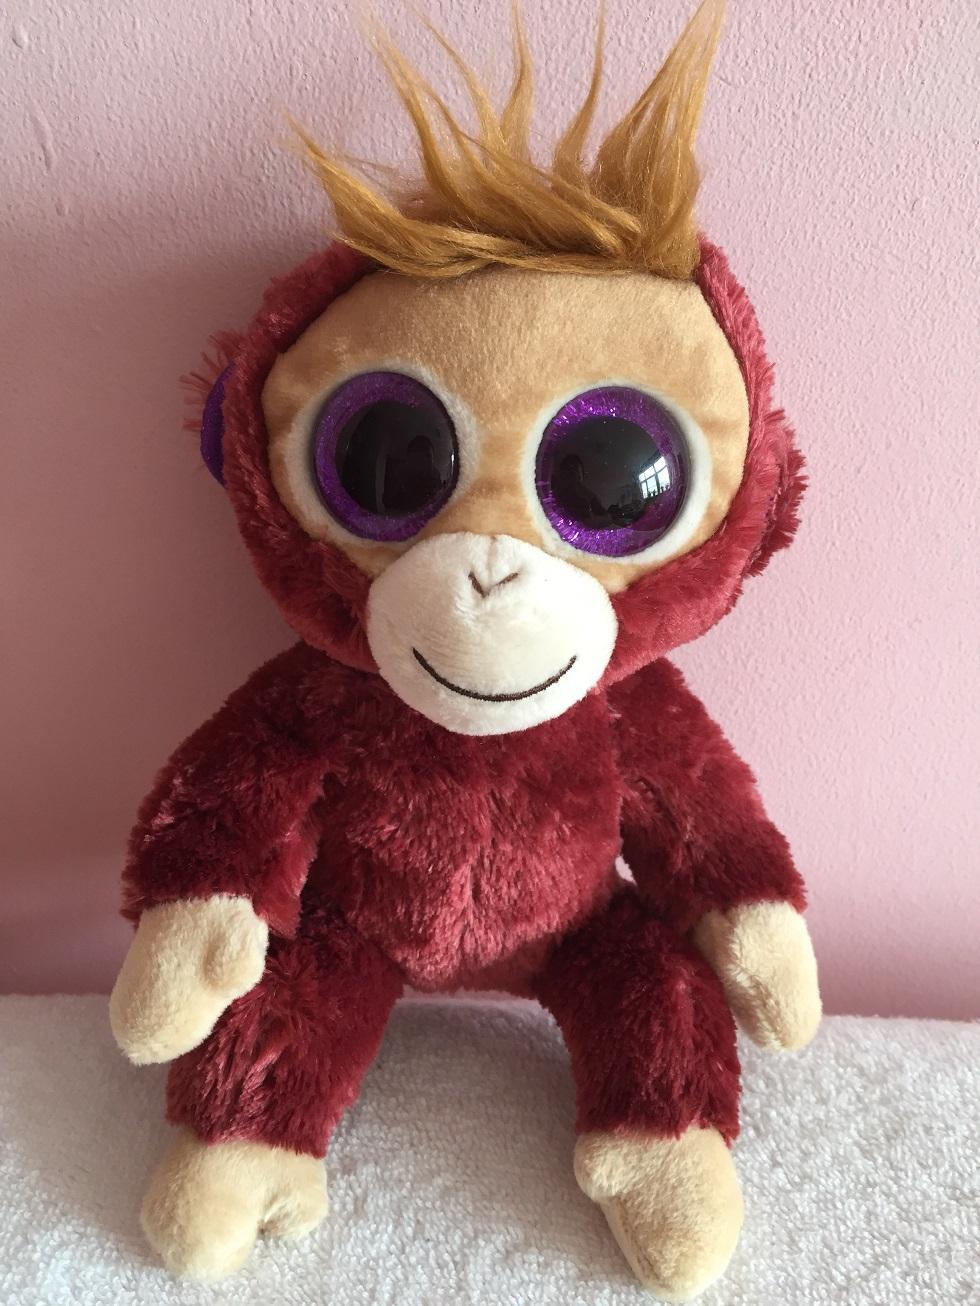 28f5efe1da4 2019 Wholesale Ty Beanie Boos ~ New Arrival CUTE 6 Boris Monkey~RARE ...